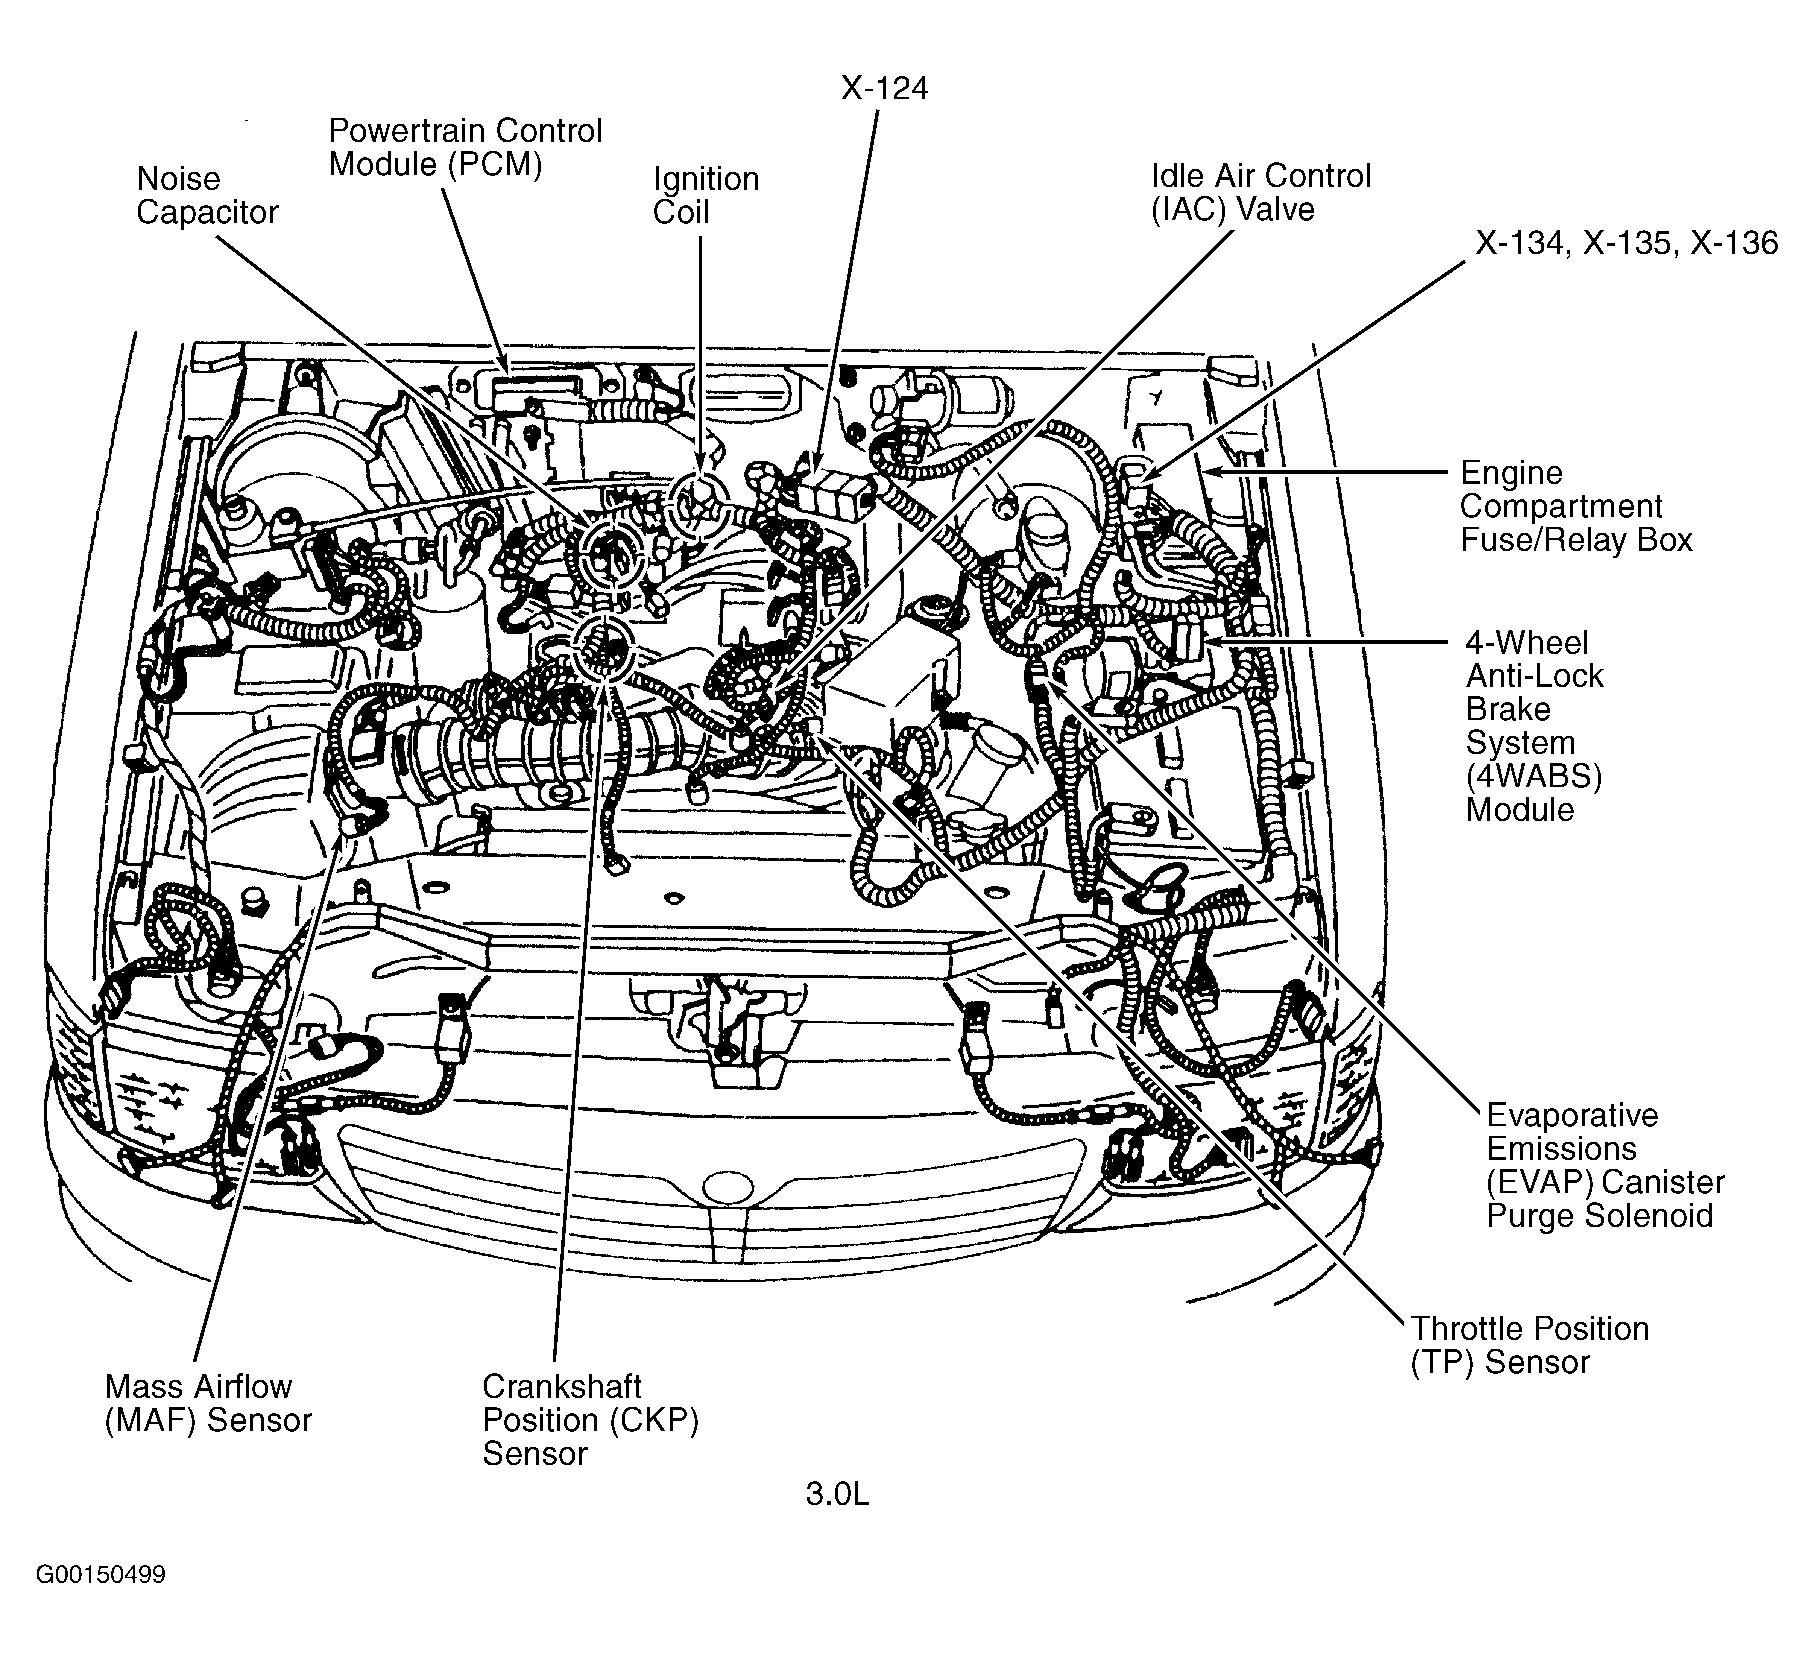 1993 Toyota Corolla Wiring Diagram